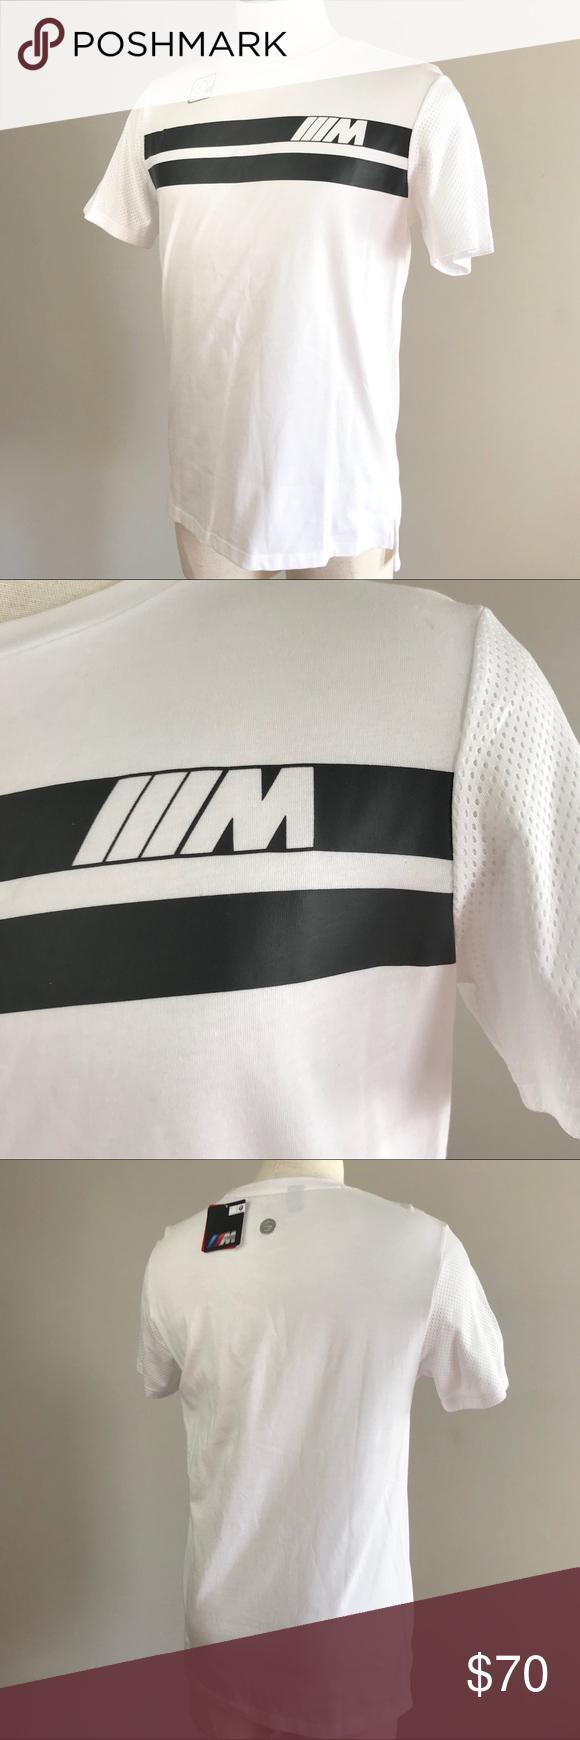 10c44c5a3c2 Puma BMW MSP M logo stripe graphic white mens tee Puma BMW Motorsport MSP M  logo graphic tee size medium 572767-02 Crew neck shirt with blue BMW M logo  on ...